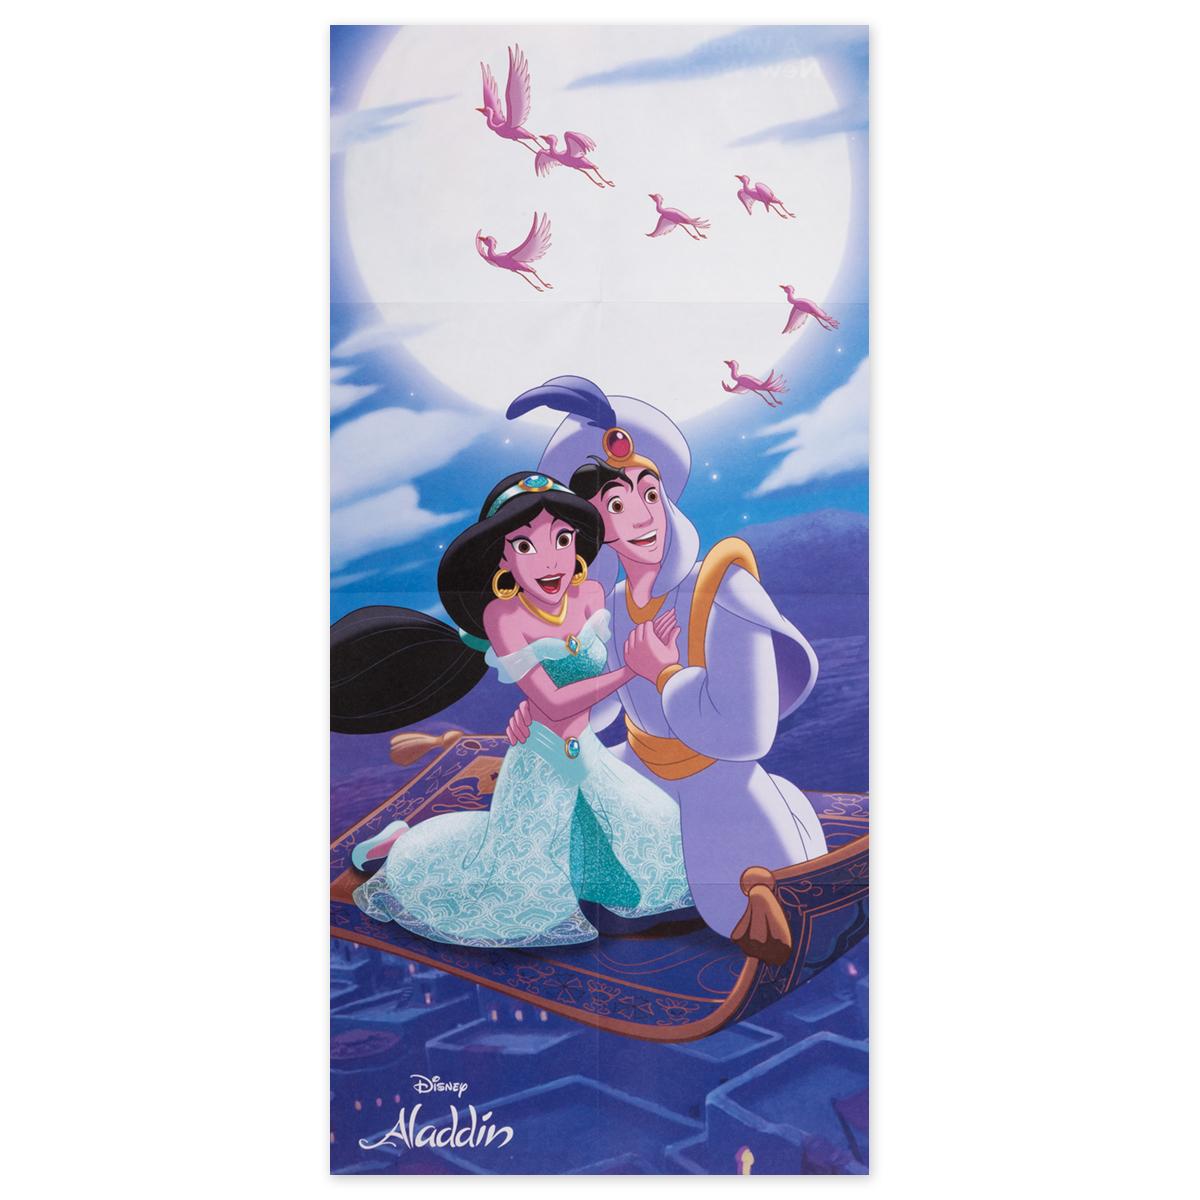 "Aladdin / A Whole New World 3"" Vinyl"